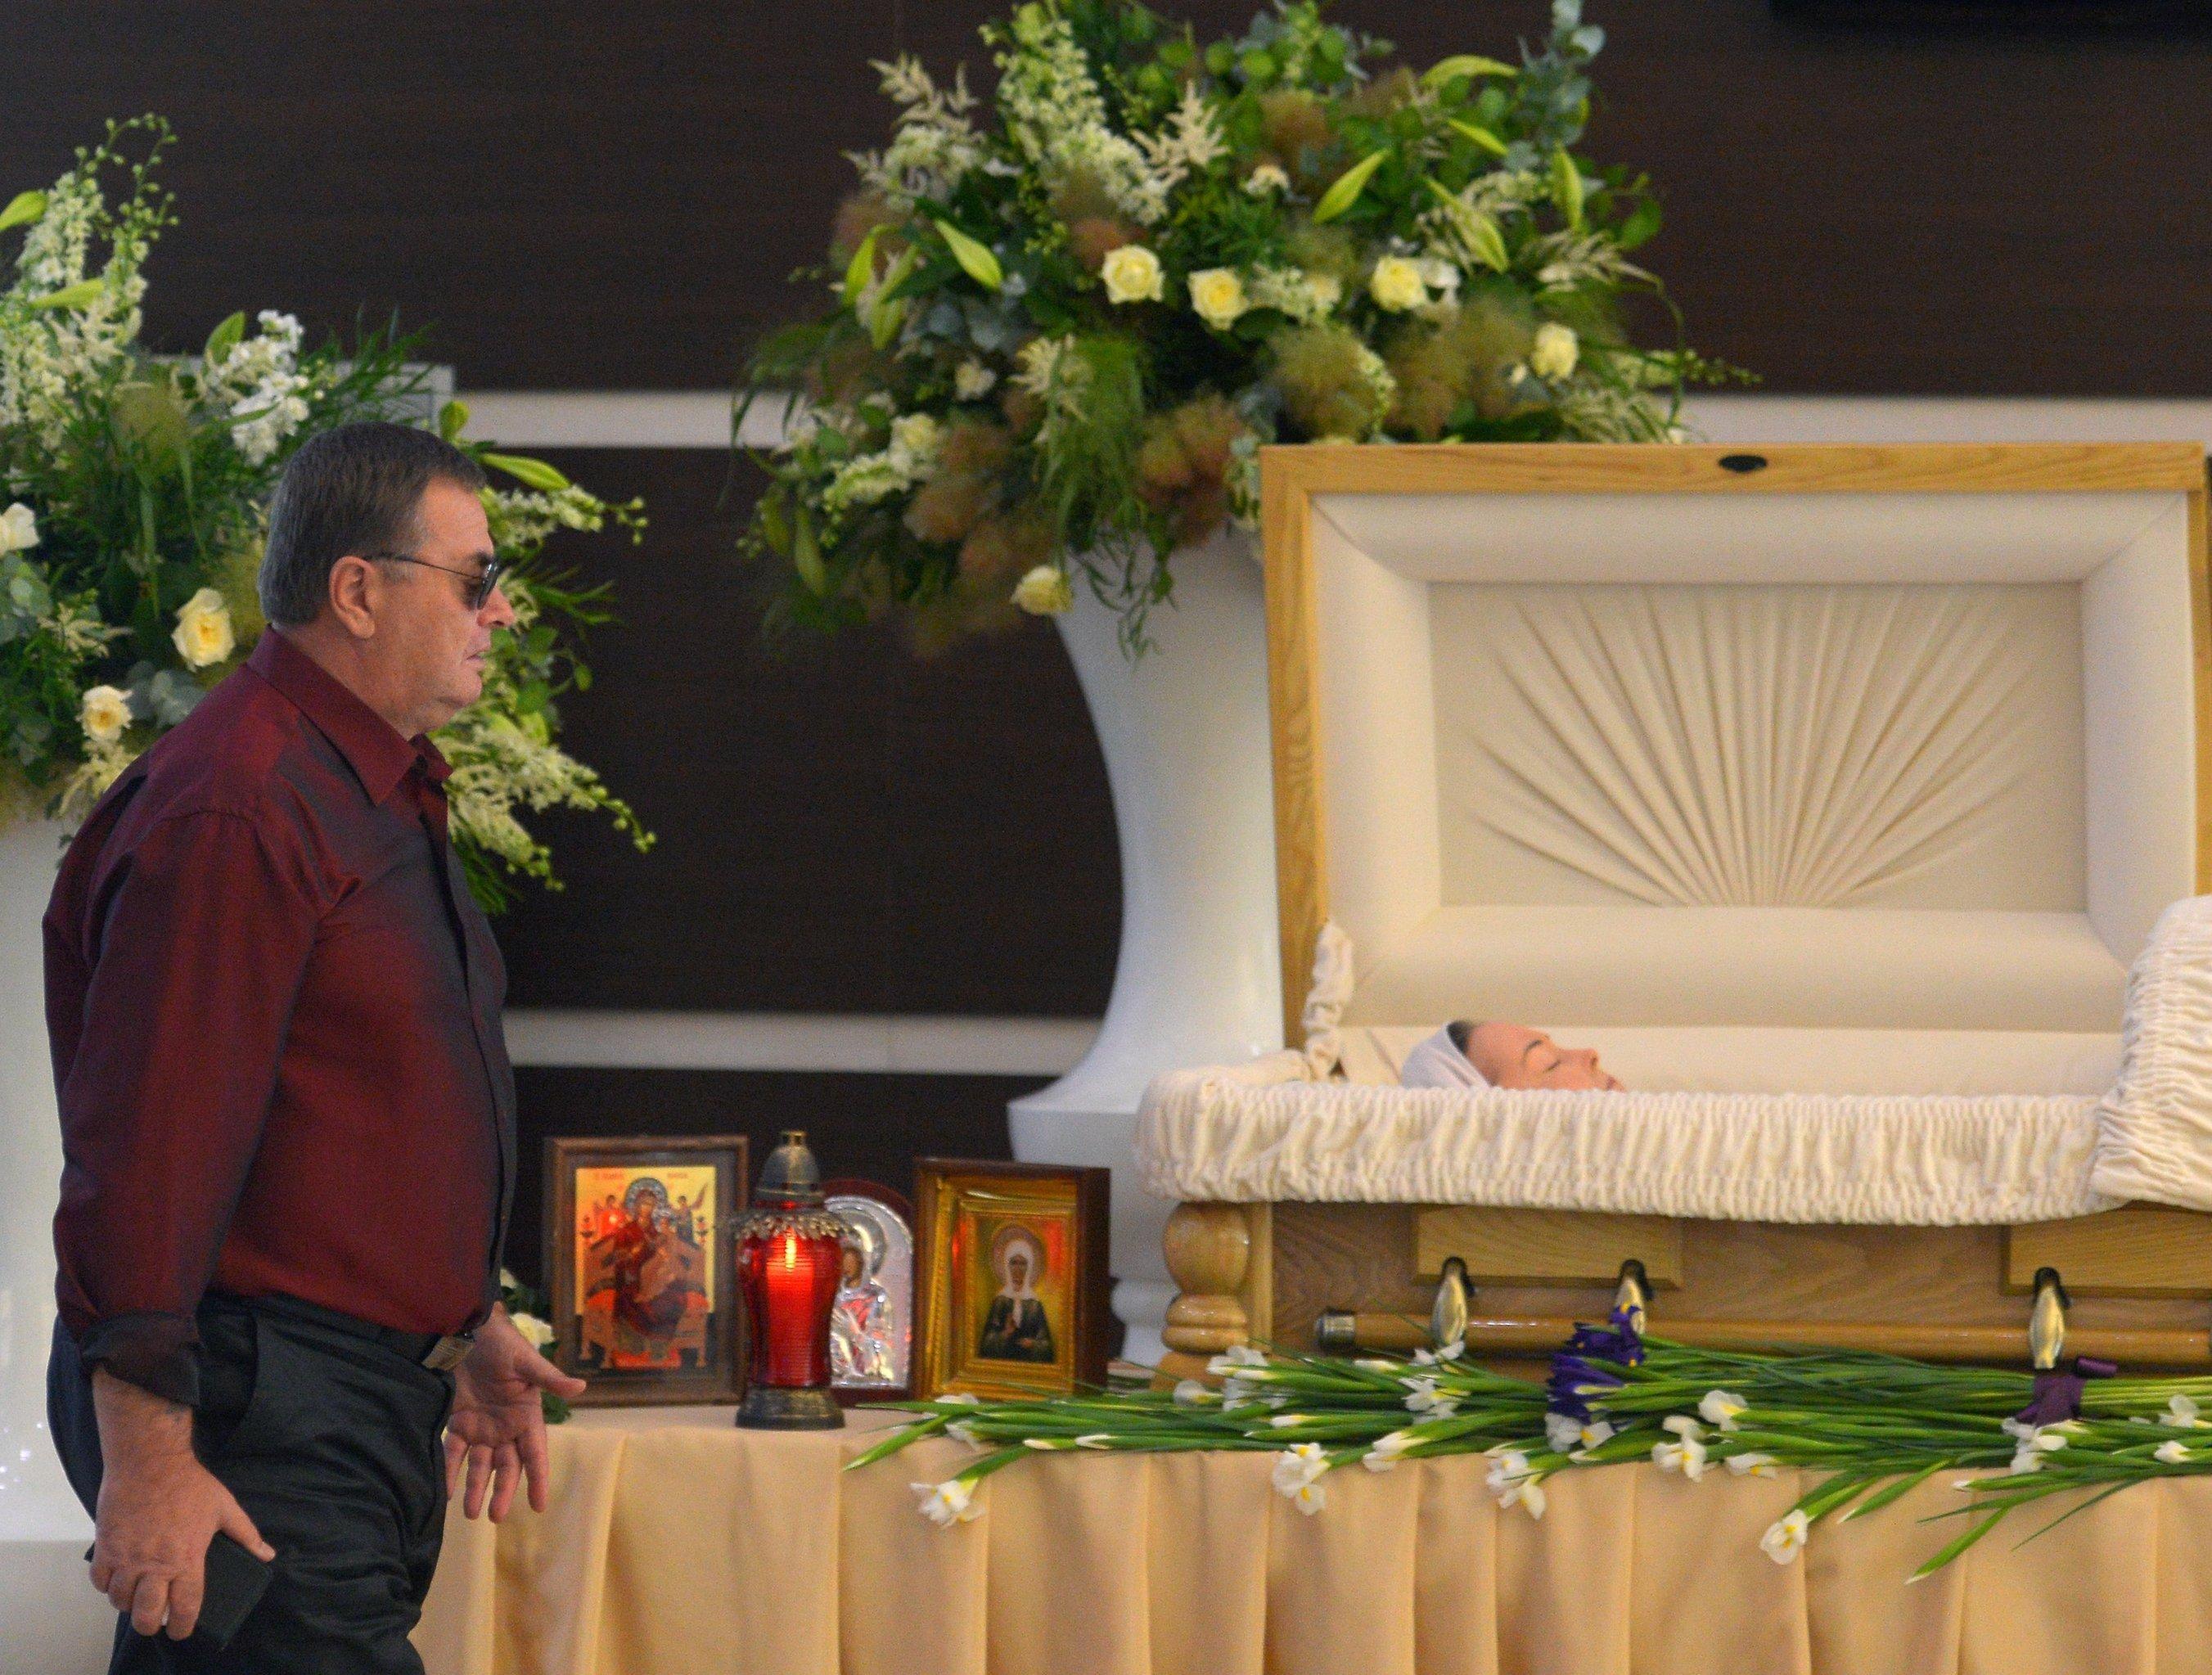 Жанна Фриске: смерть певицы, детали похорон, фото | StarHit.ru